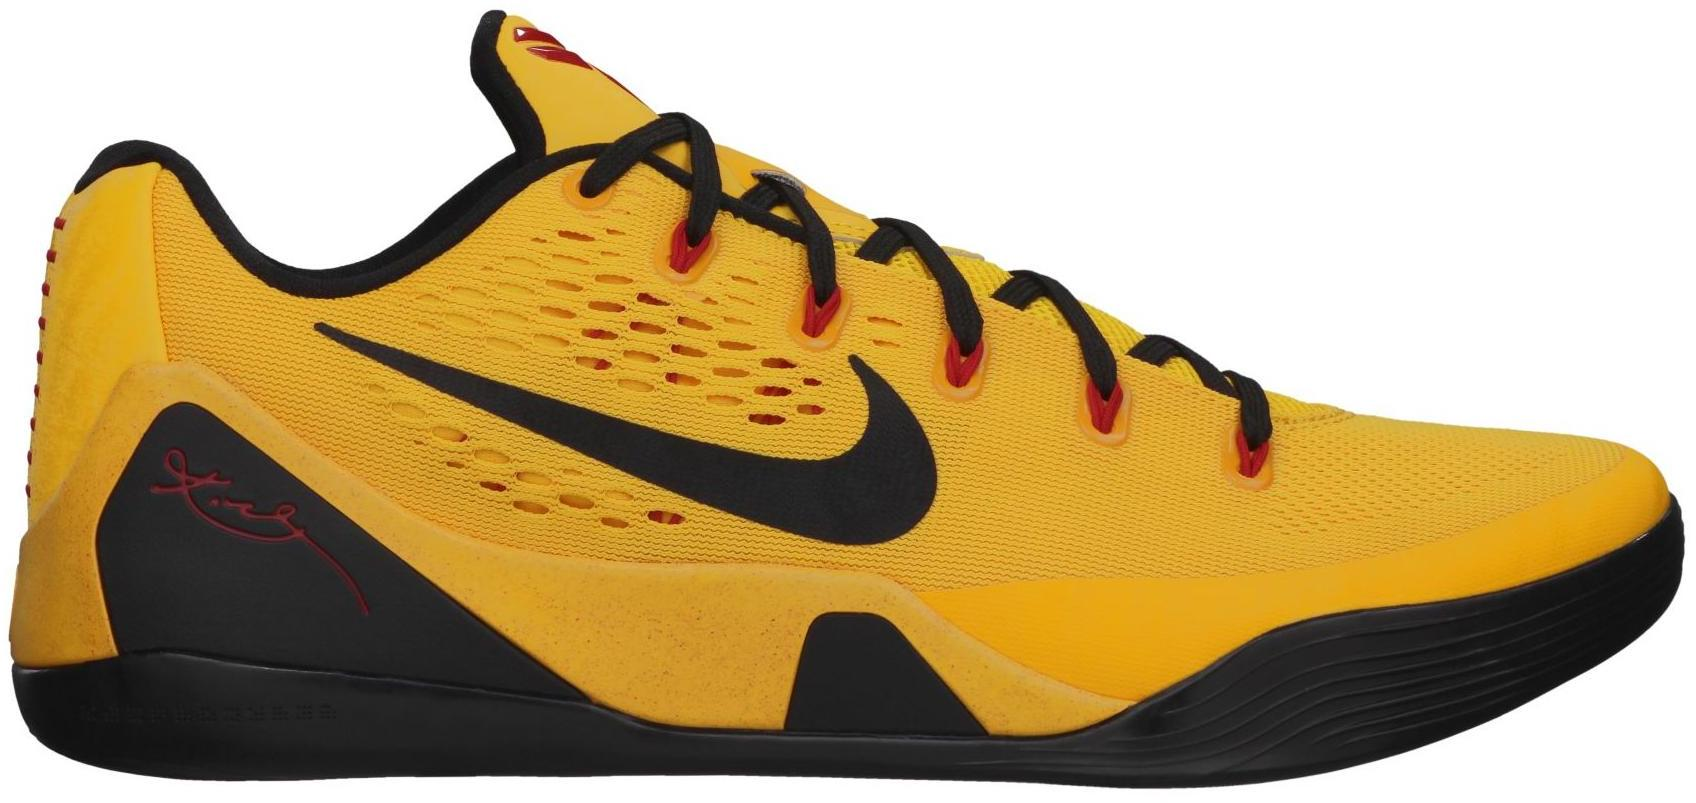 Buy Nike Kobe 9 Shoes \u0026 Deadstock Sneakers